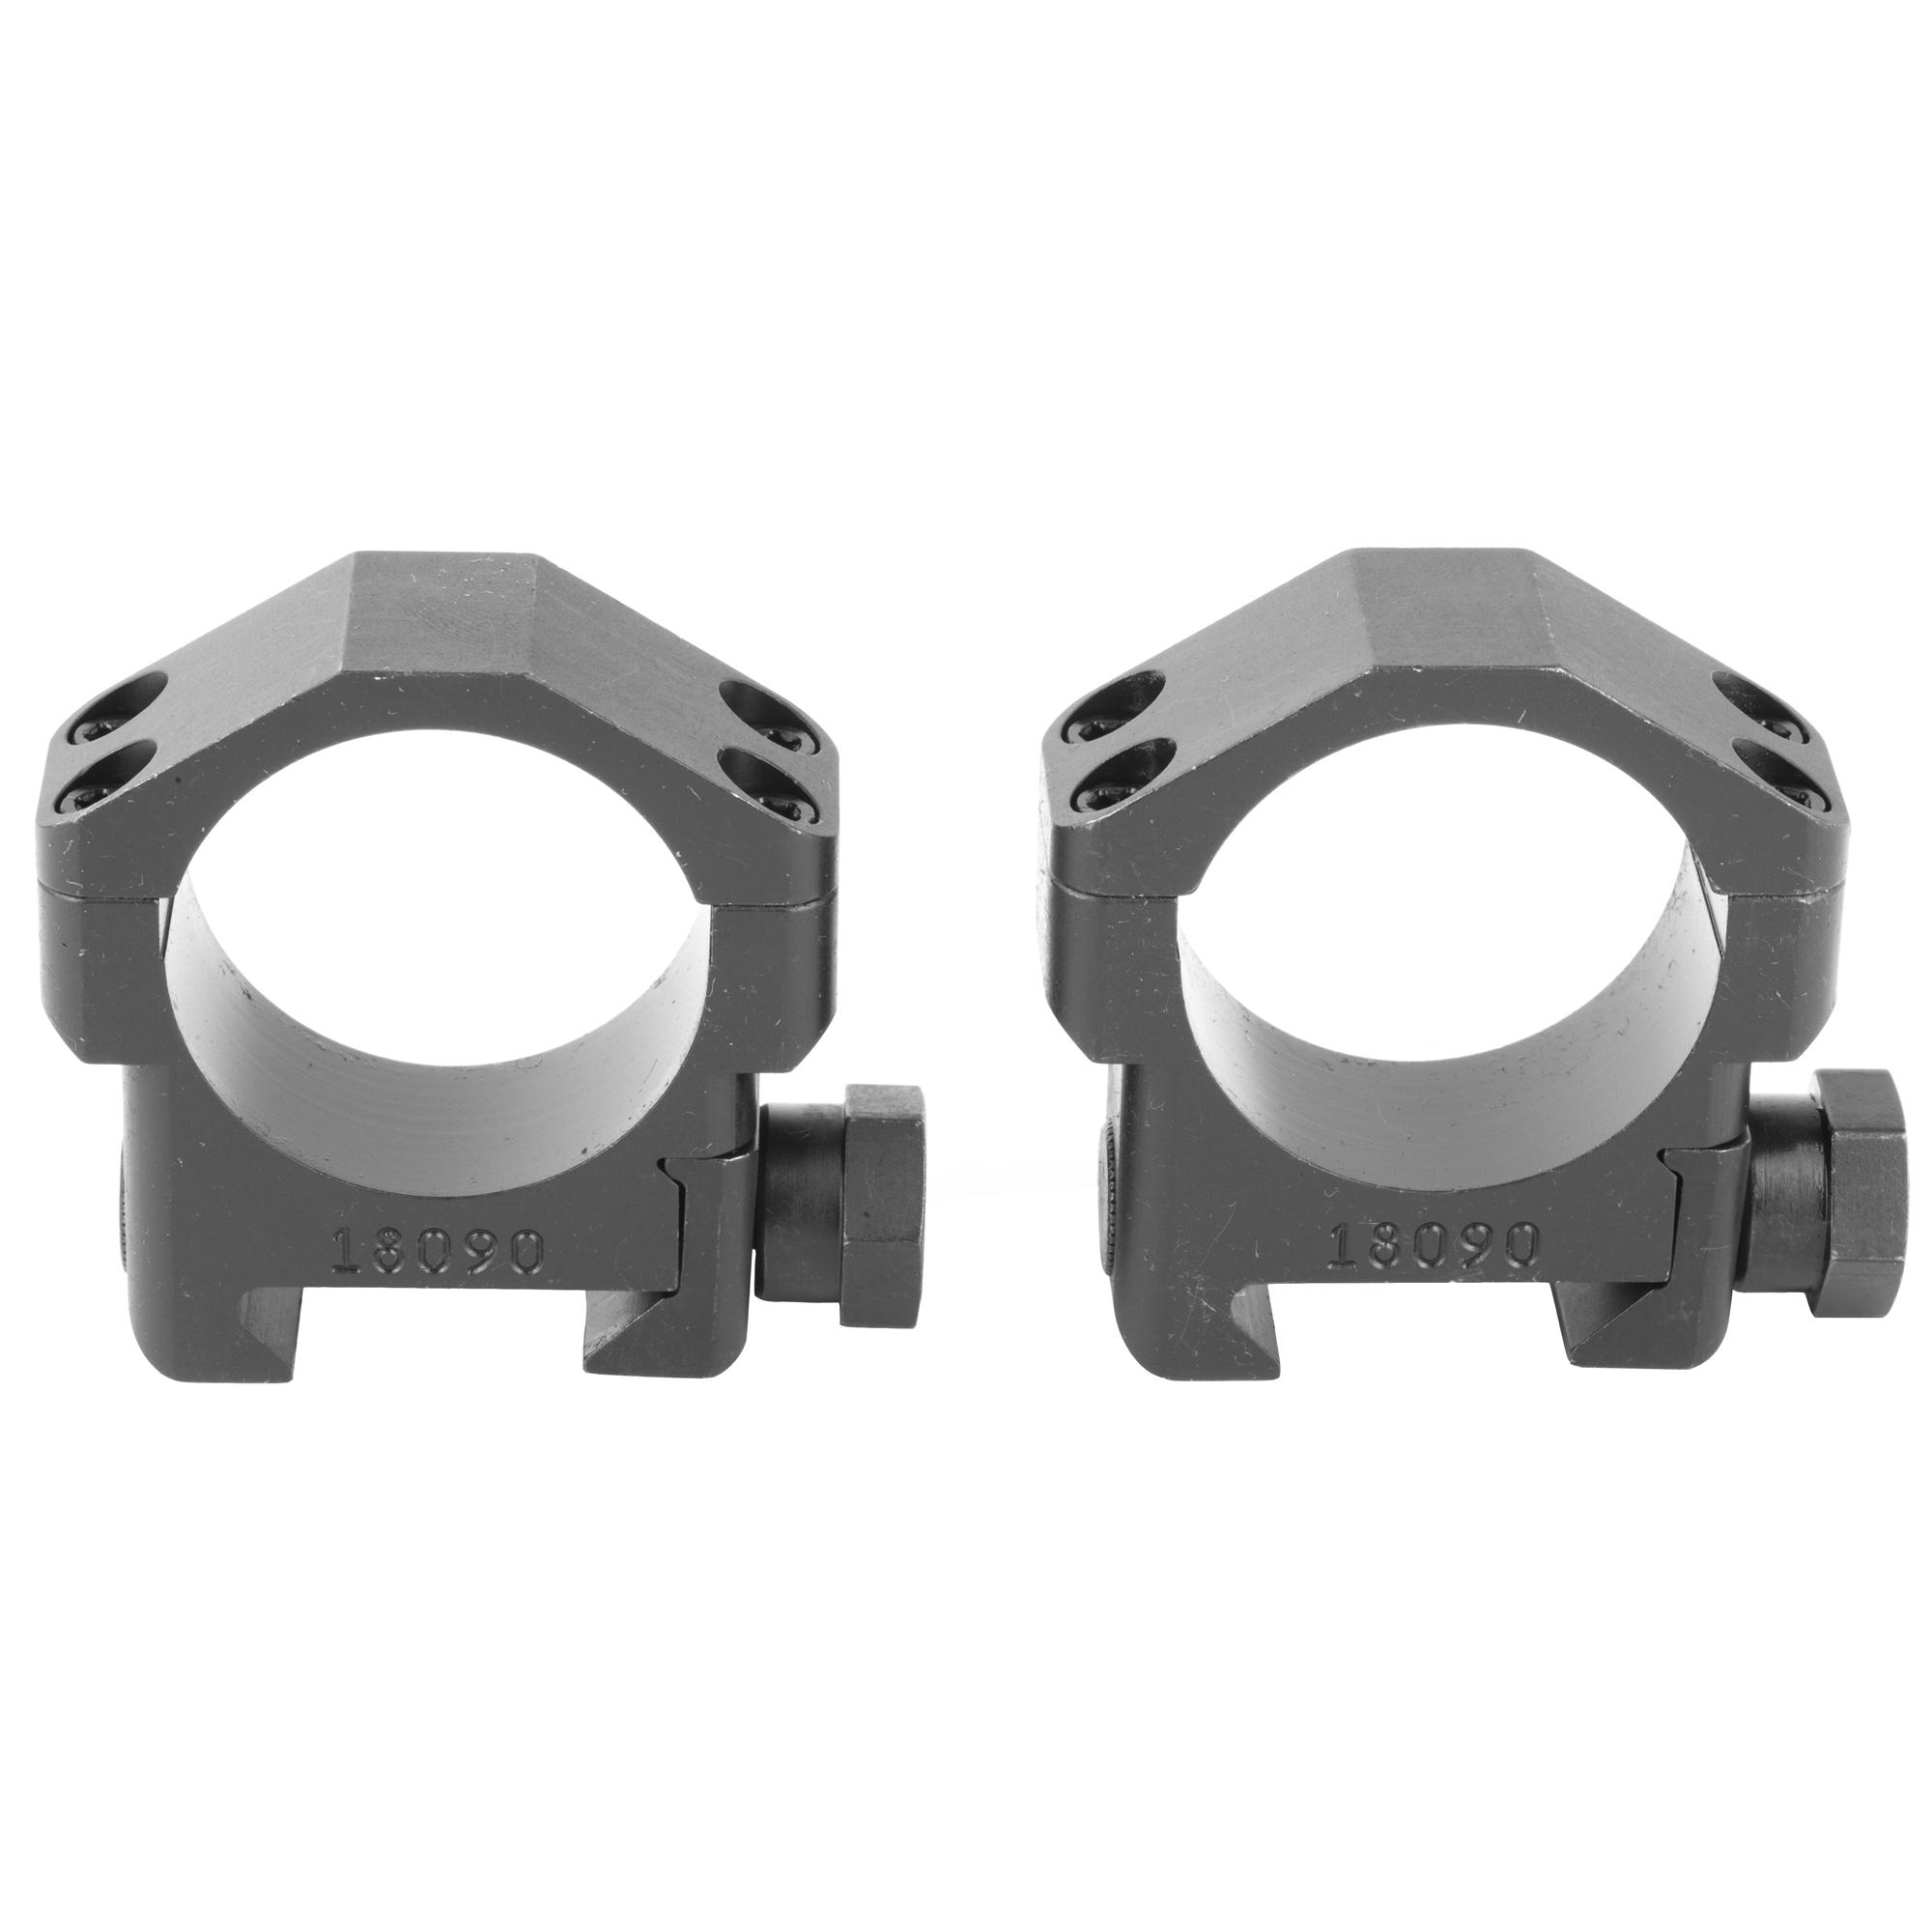 Badger 30mm Scope Ring Std